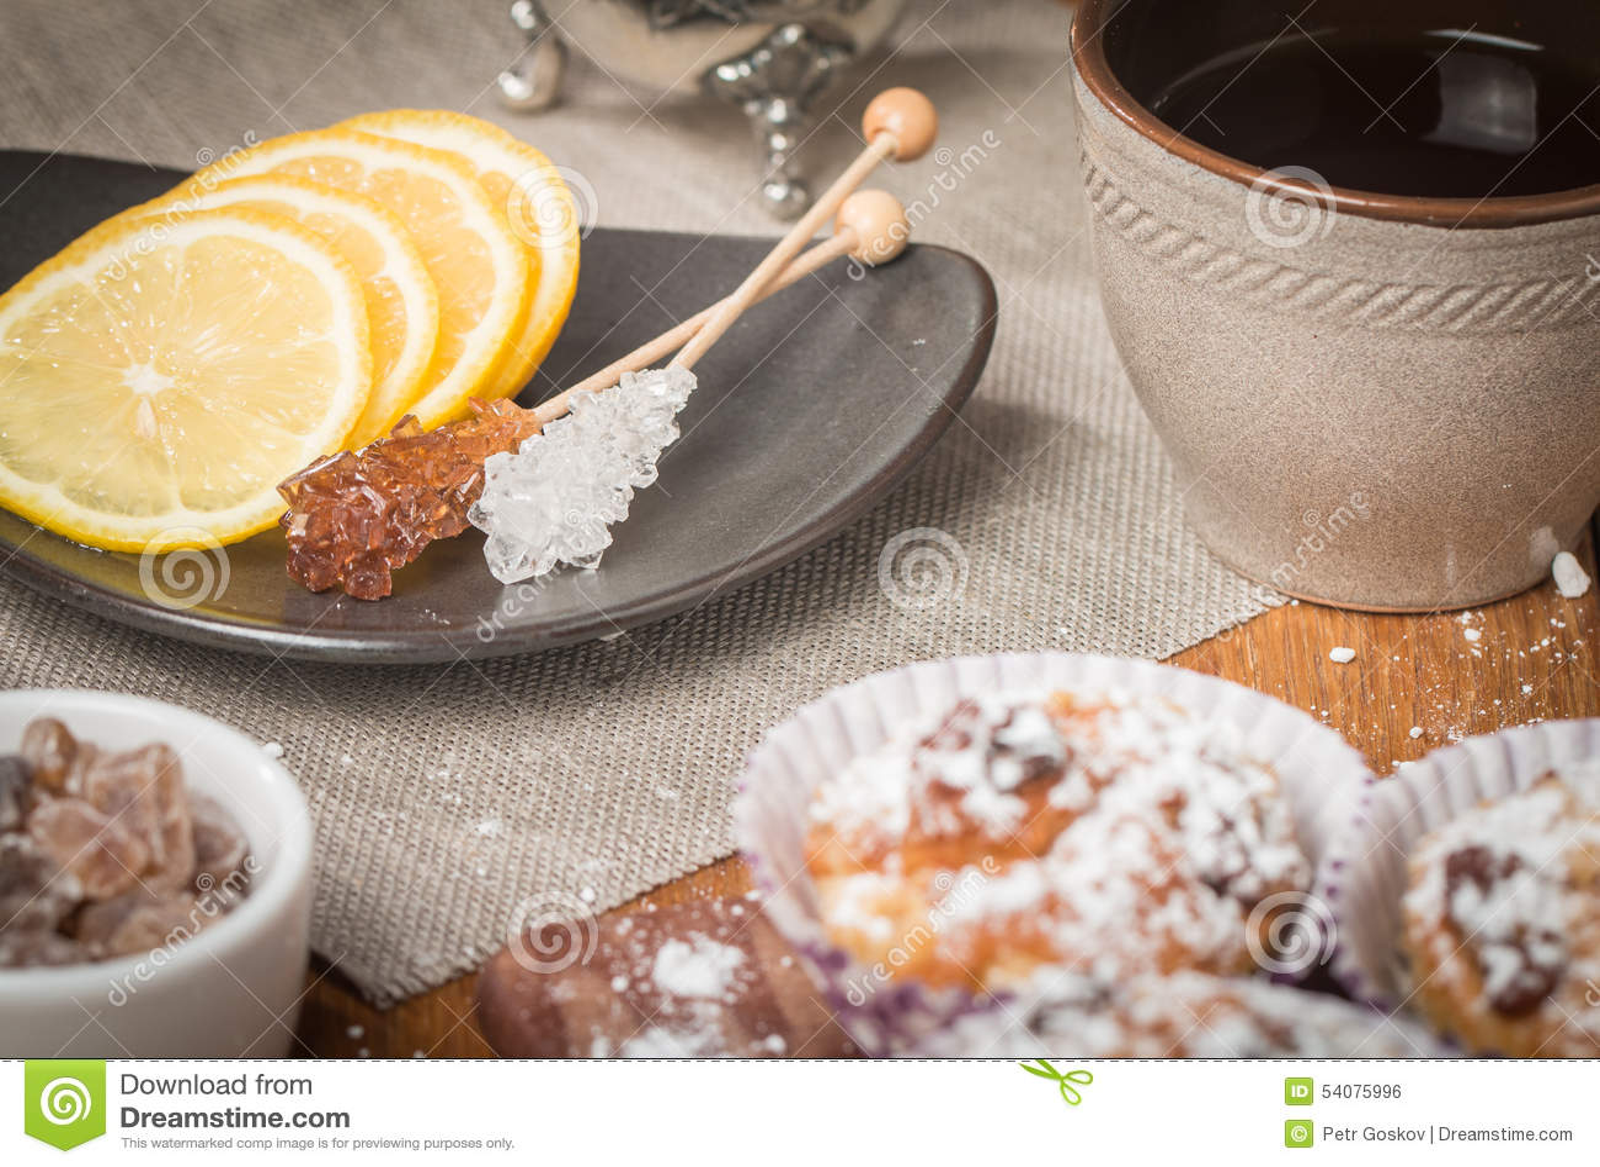 Chrystal suiker met citroen en thee